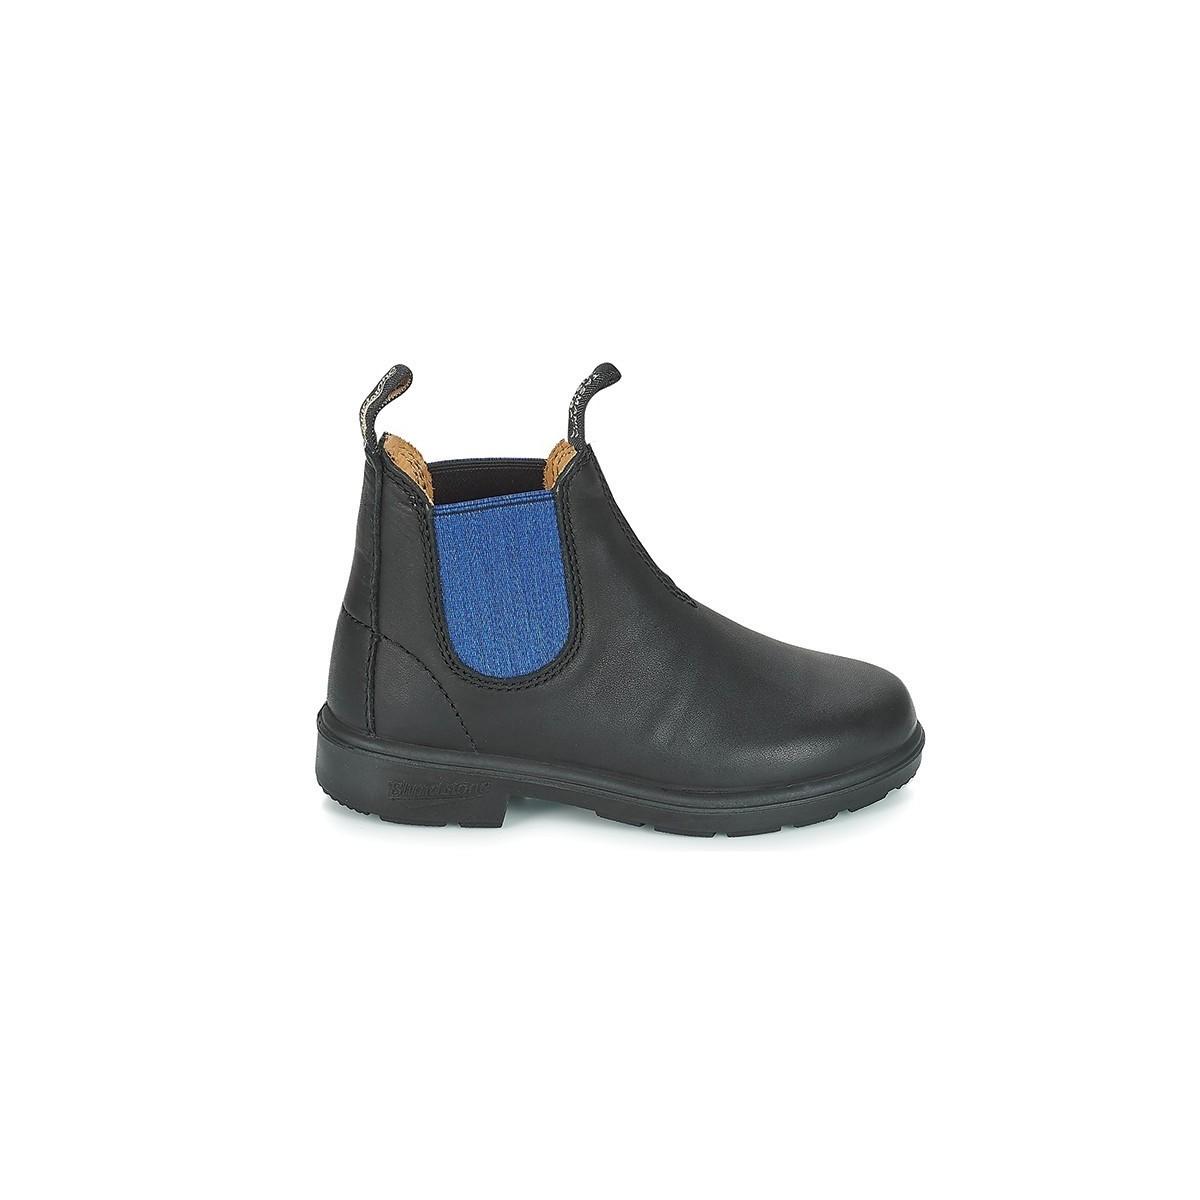 Boots Blundstone kids Blunnies boots Black/blue